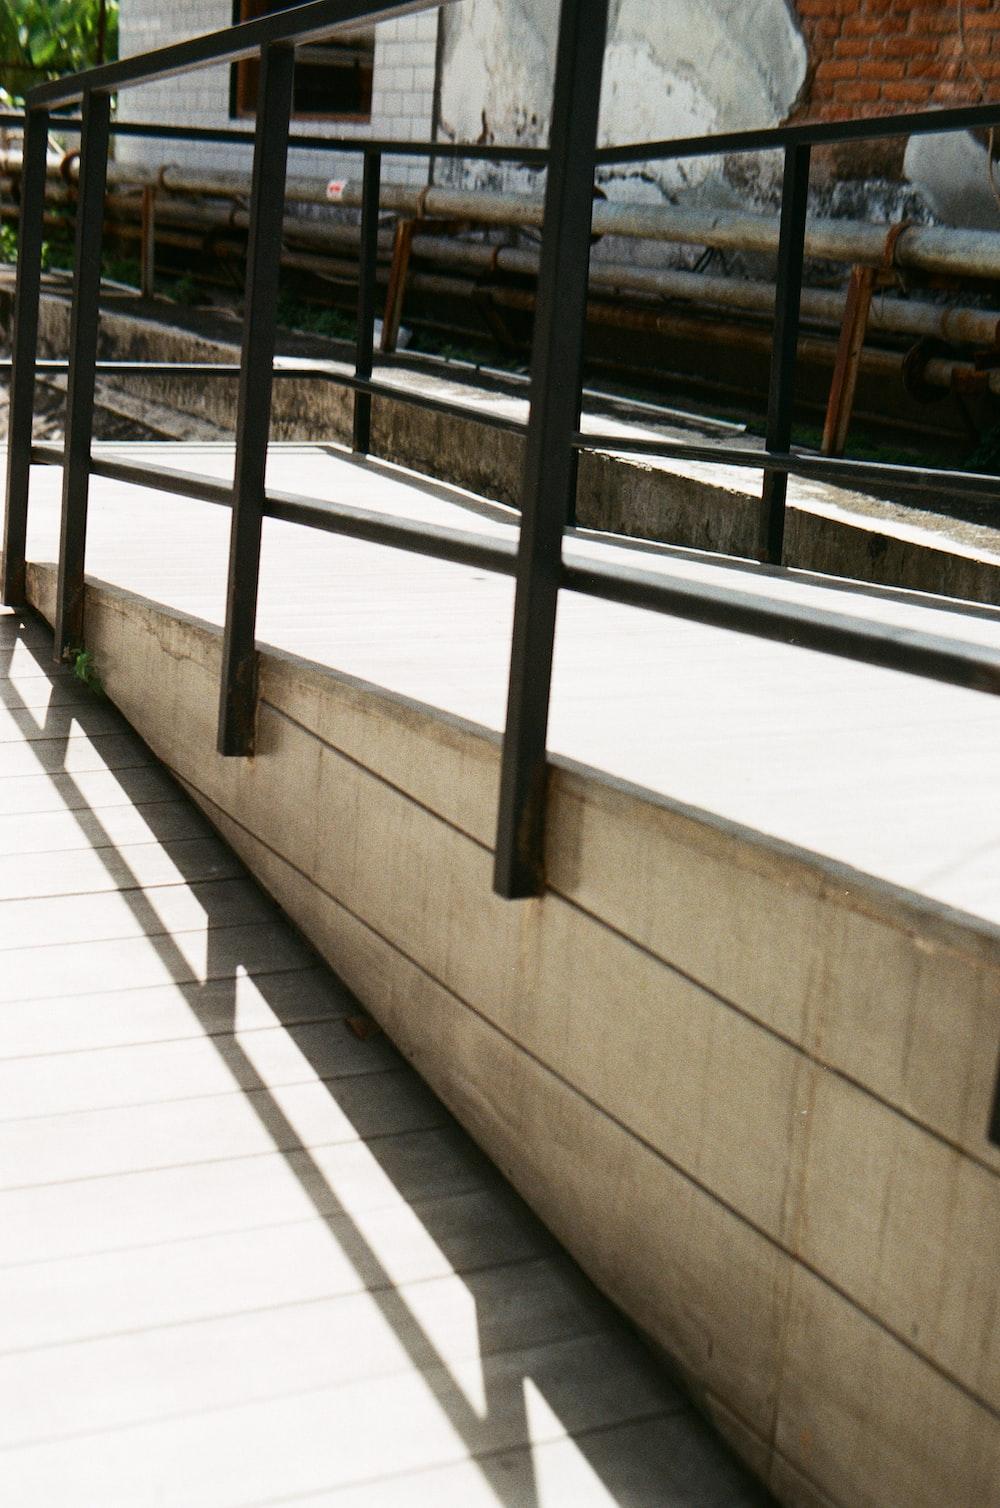 black metal railings on white floor tiles